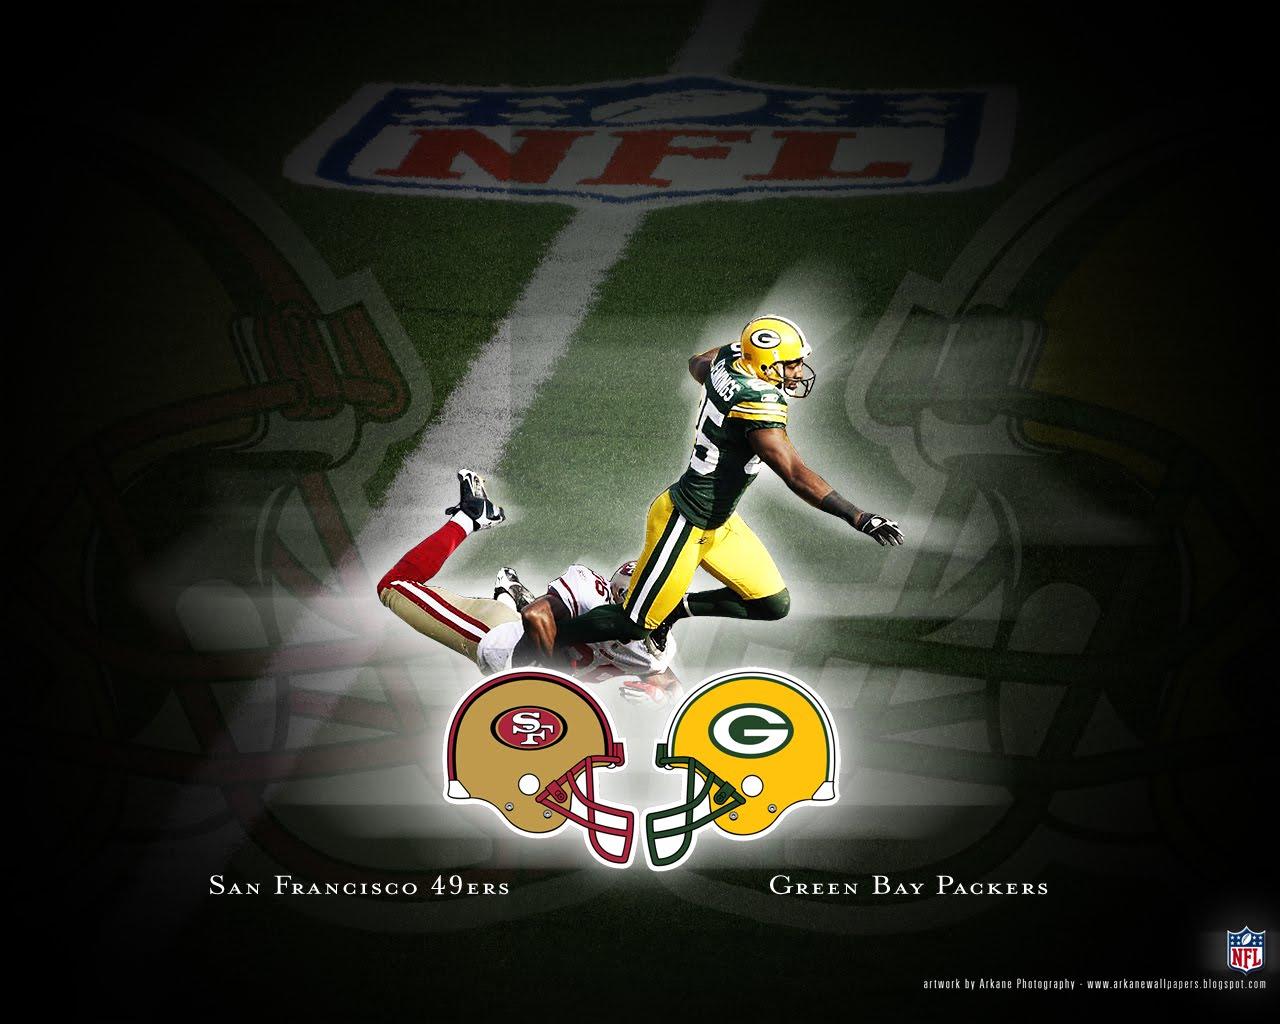 http://1.bp.blogspot.com/_JuYYGgmnUQU/SwwG1XXhAwI/AAAAAAAAAmg/ElSZjDlkKwQ/s1600/Battle11-49ers-Packers.jpeg